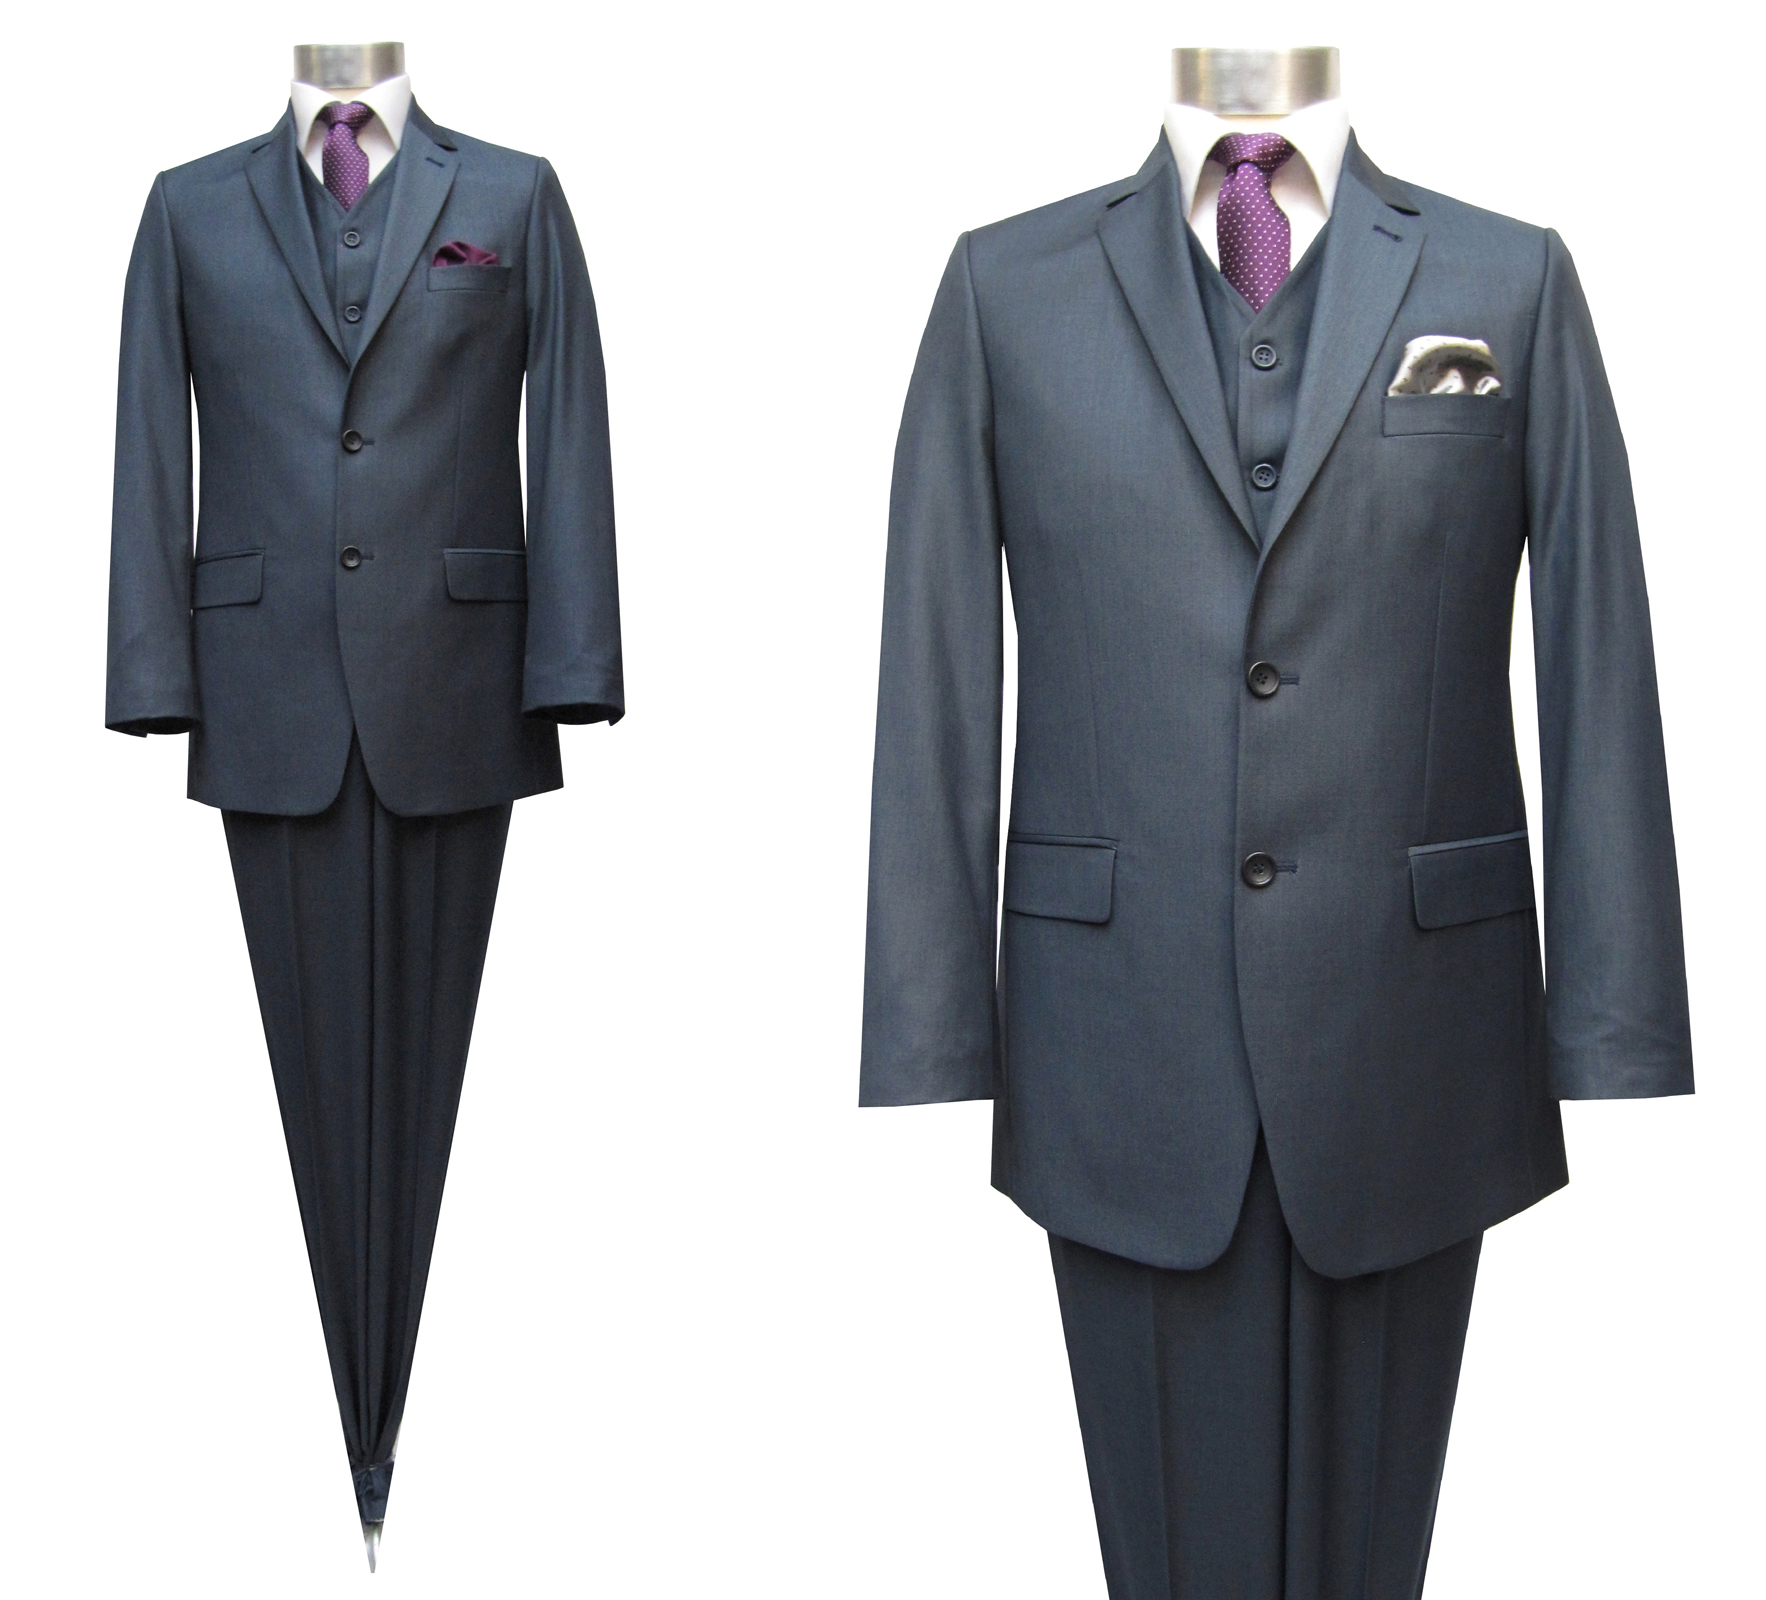 Muga Homme Costume Grisbleu 120s 3 Pièces Design by MUGA ® 50f083d97dd